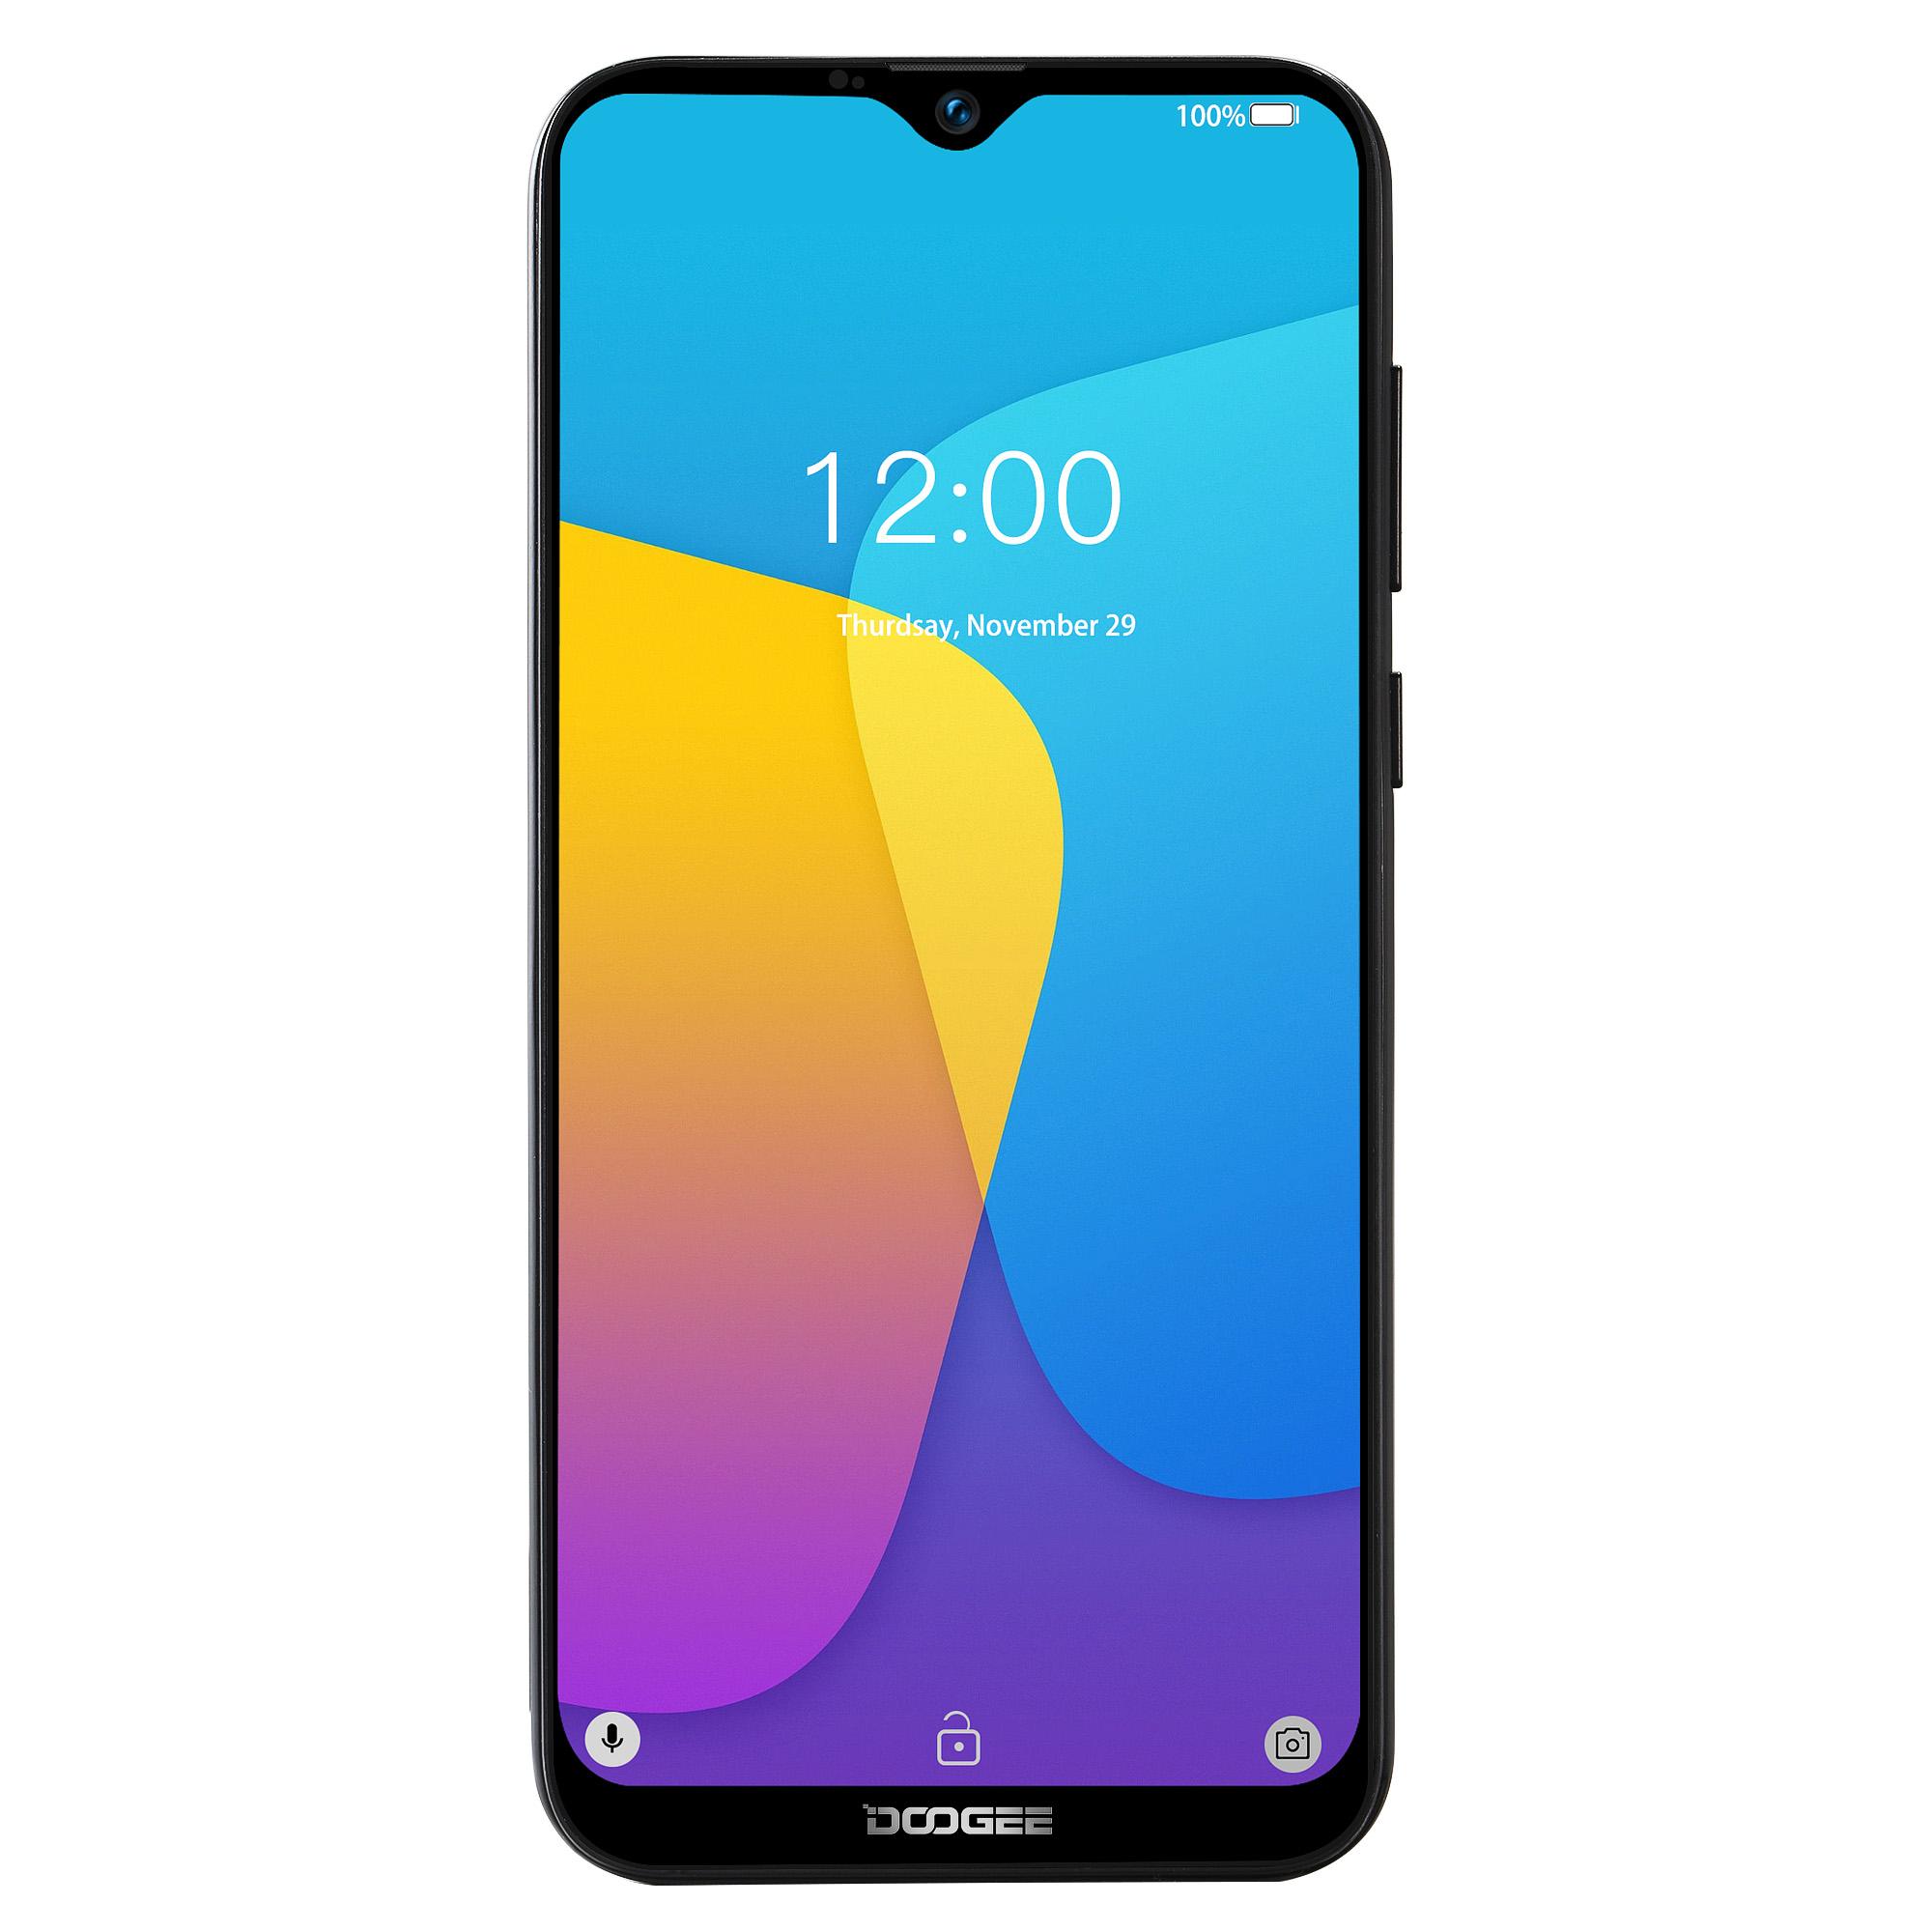 Original DOOGEE X90 Cellphone 6.1inch 19:9 Waterdrop LTPS Screen Smartphone Quad Core CPU 1GB RAM+16GB ROM 3400mAh Battery Dual SIM Cards 8MP+5MP Camera Android 8.1 OS  Black_Russian version